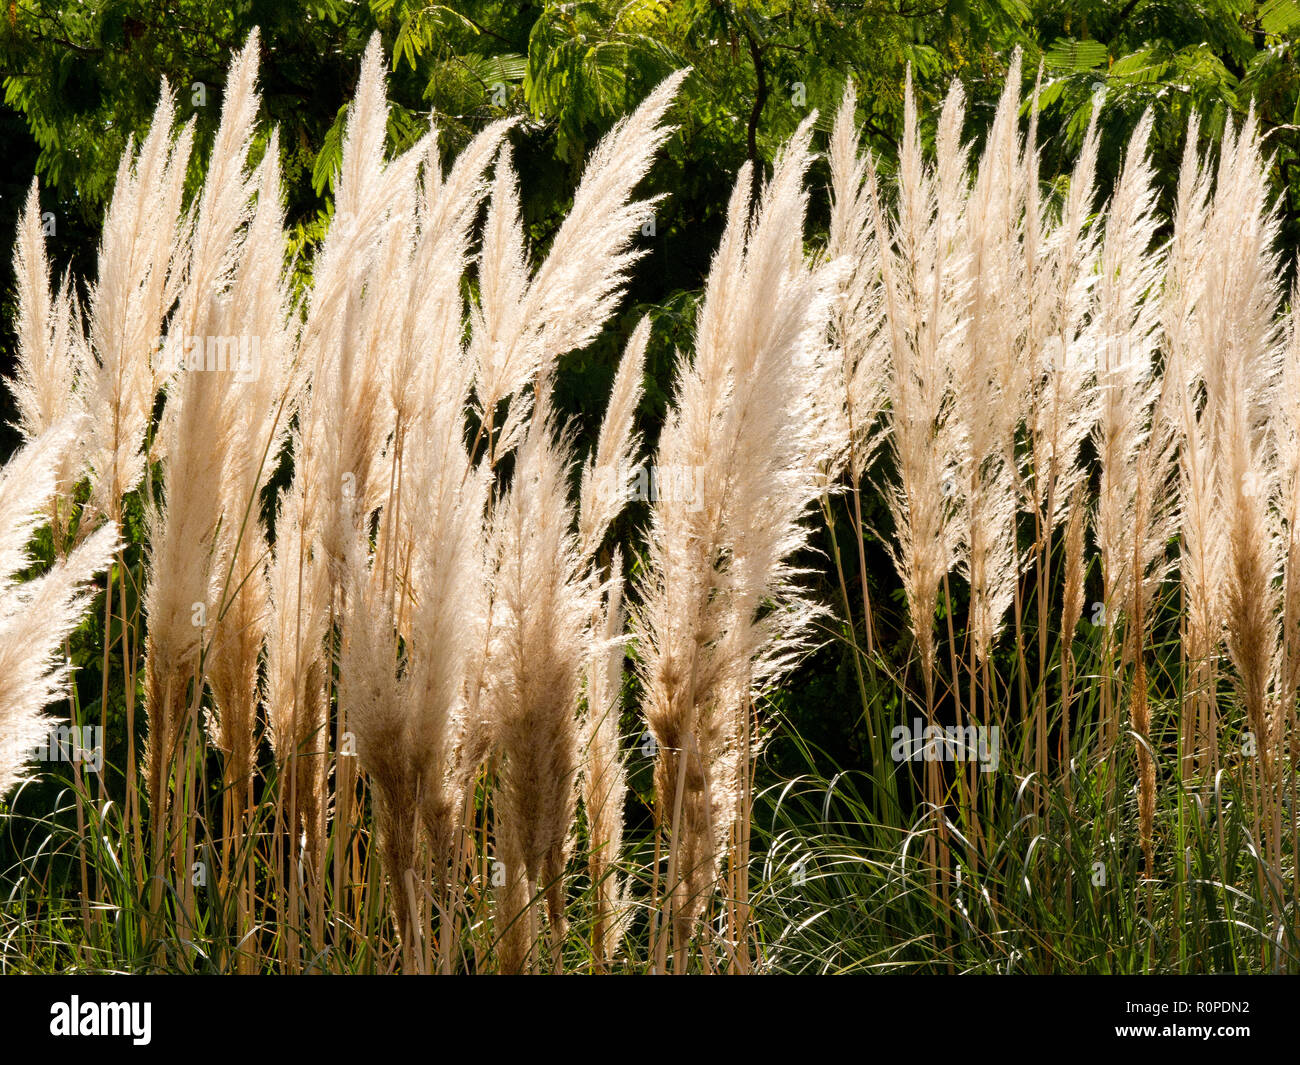 Reed, Jardines del Turia, Turia river. Valencia, Spain - Stock Image